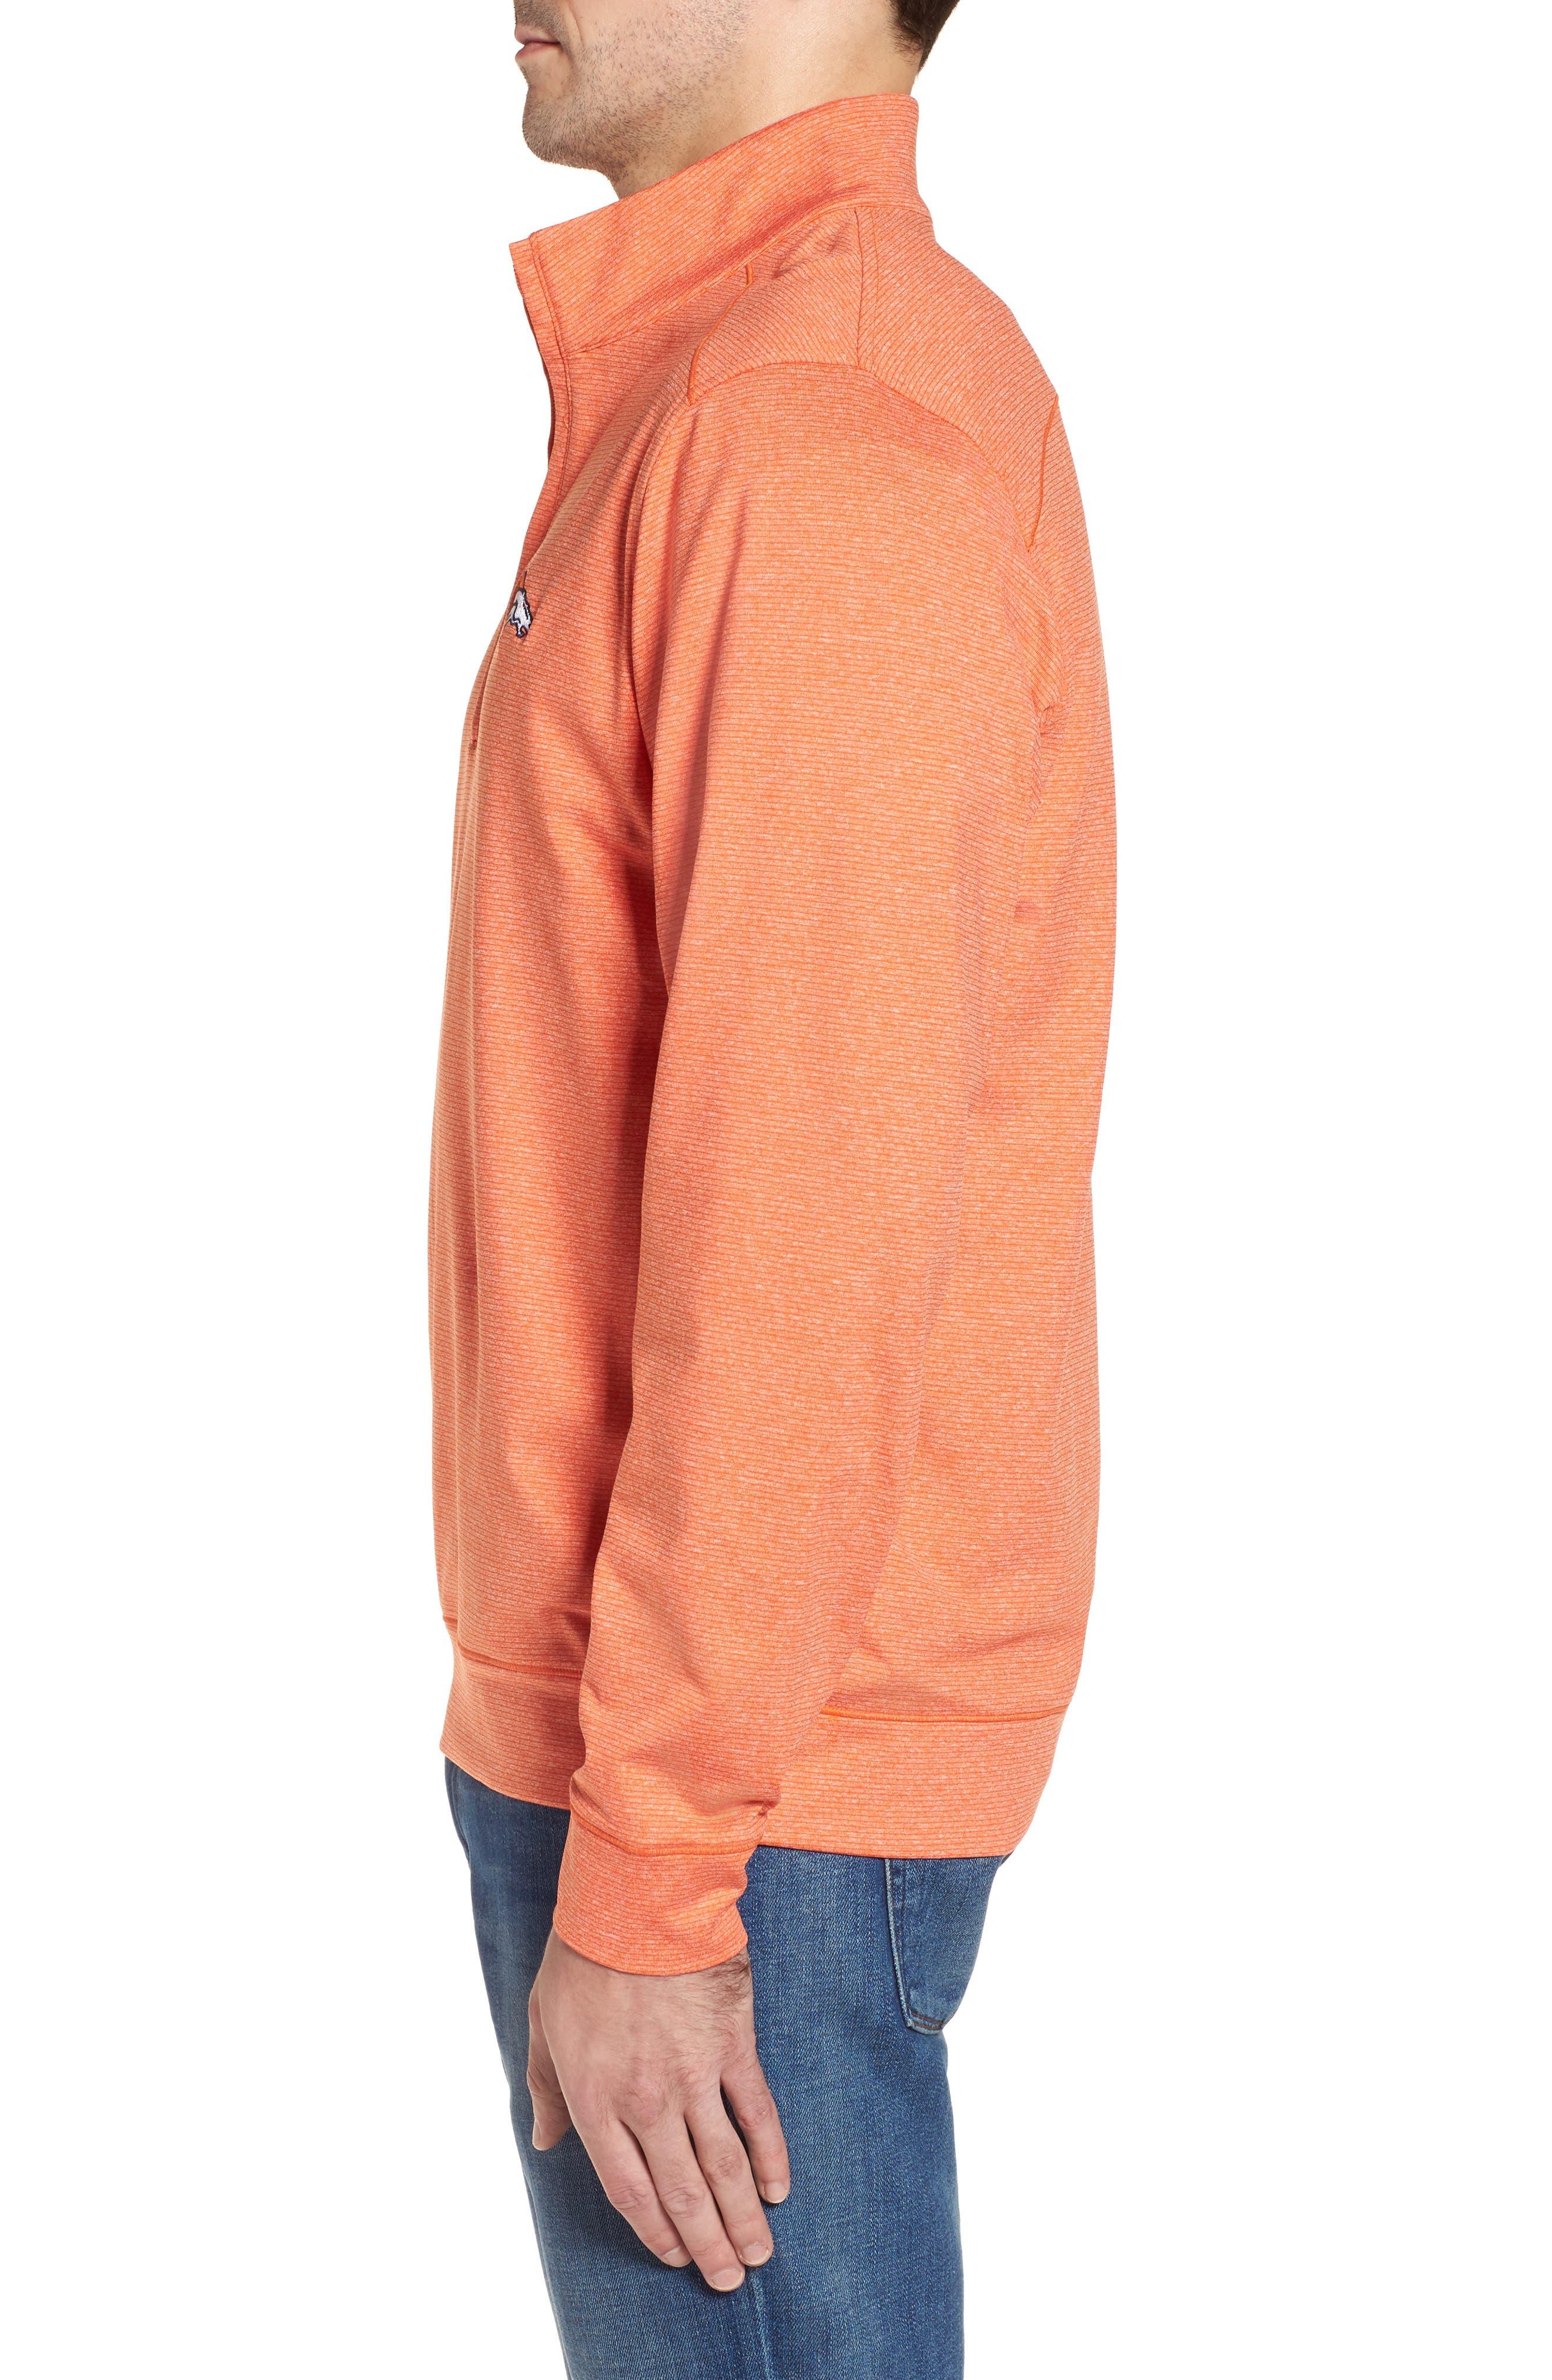 Shoreline - Denver Broncos Half Zip Pullover,                             Alternate thumbnail 3, color,                             College Orange Heather